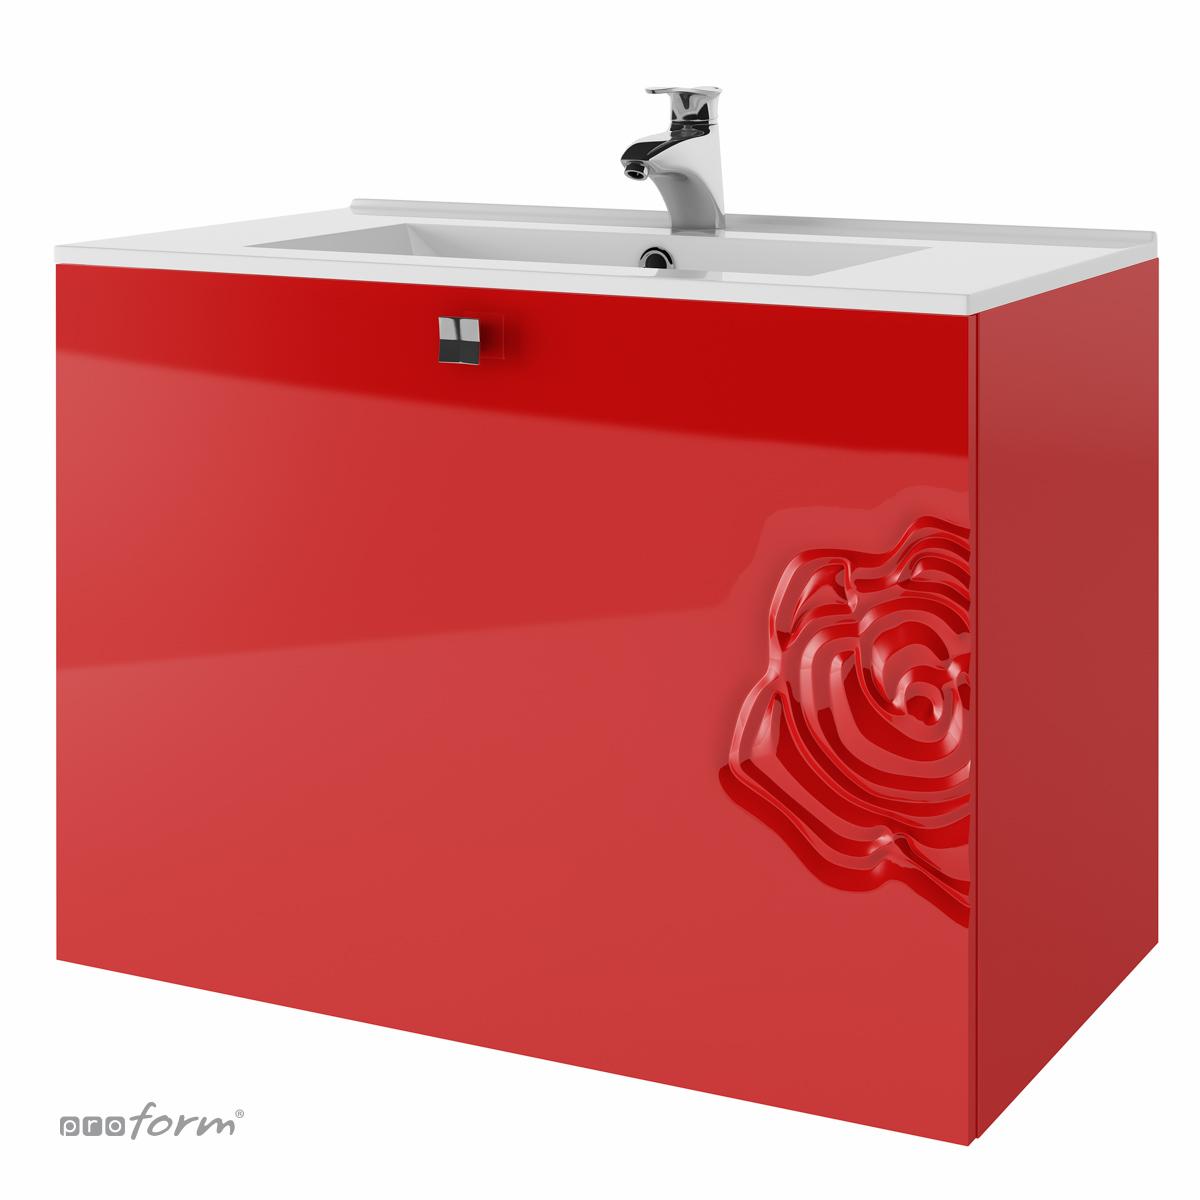 Szafka ROSE pod umywalkę 80 czerwona Proform